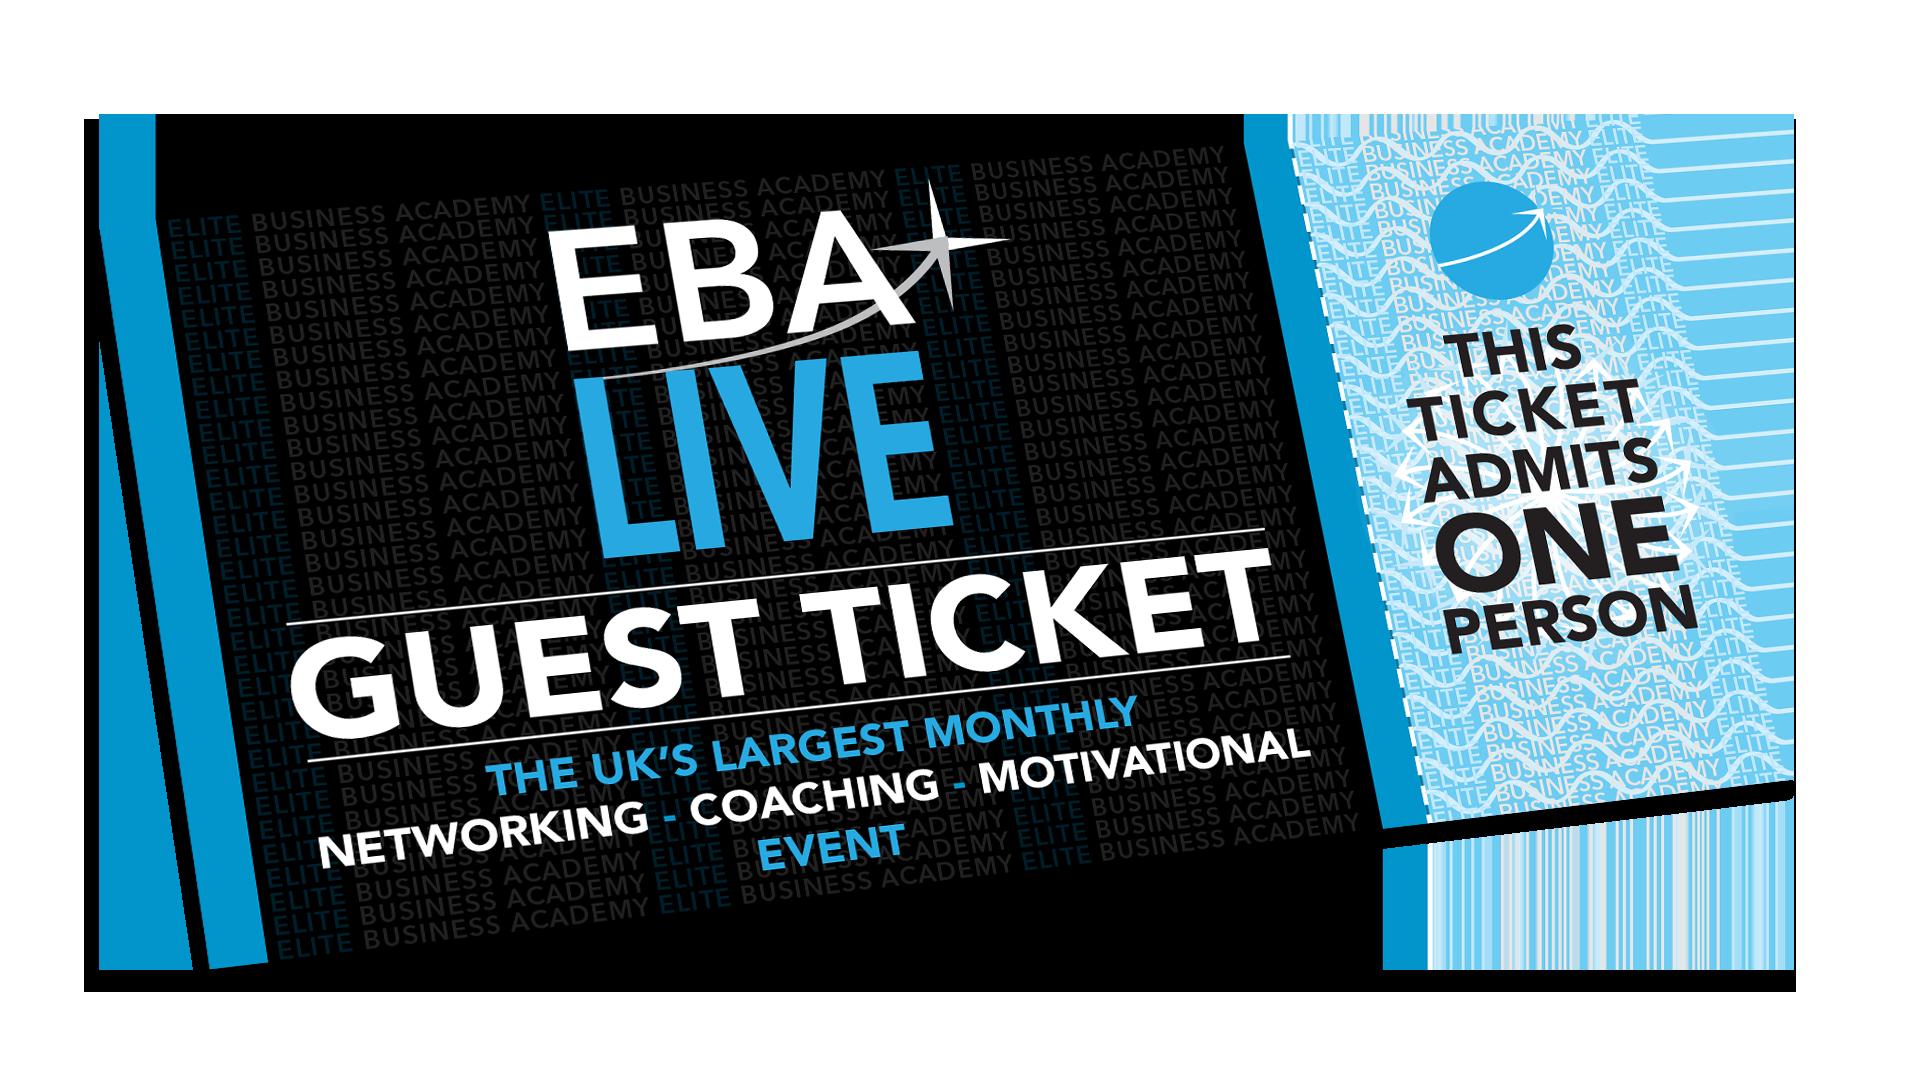 EBA Live Networking Event Ticket Sheffield